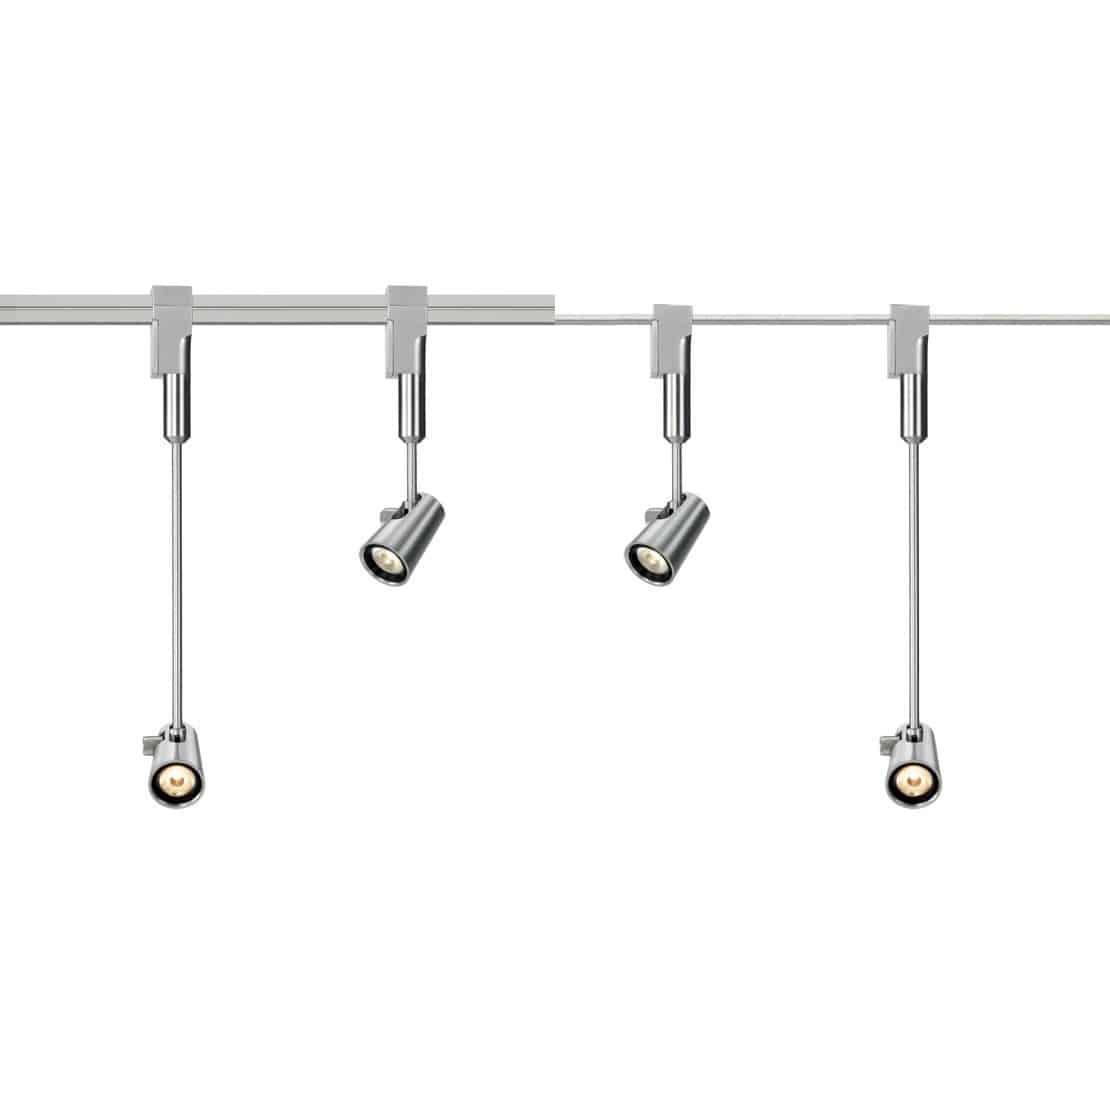 LED track light / round / metal / museum - PLAY PLUG  sc 1 st  ArchiExpo & LED track light / round / metal / museum - PLAY PLUG - Altatensione azcodes.com